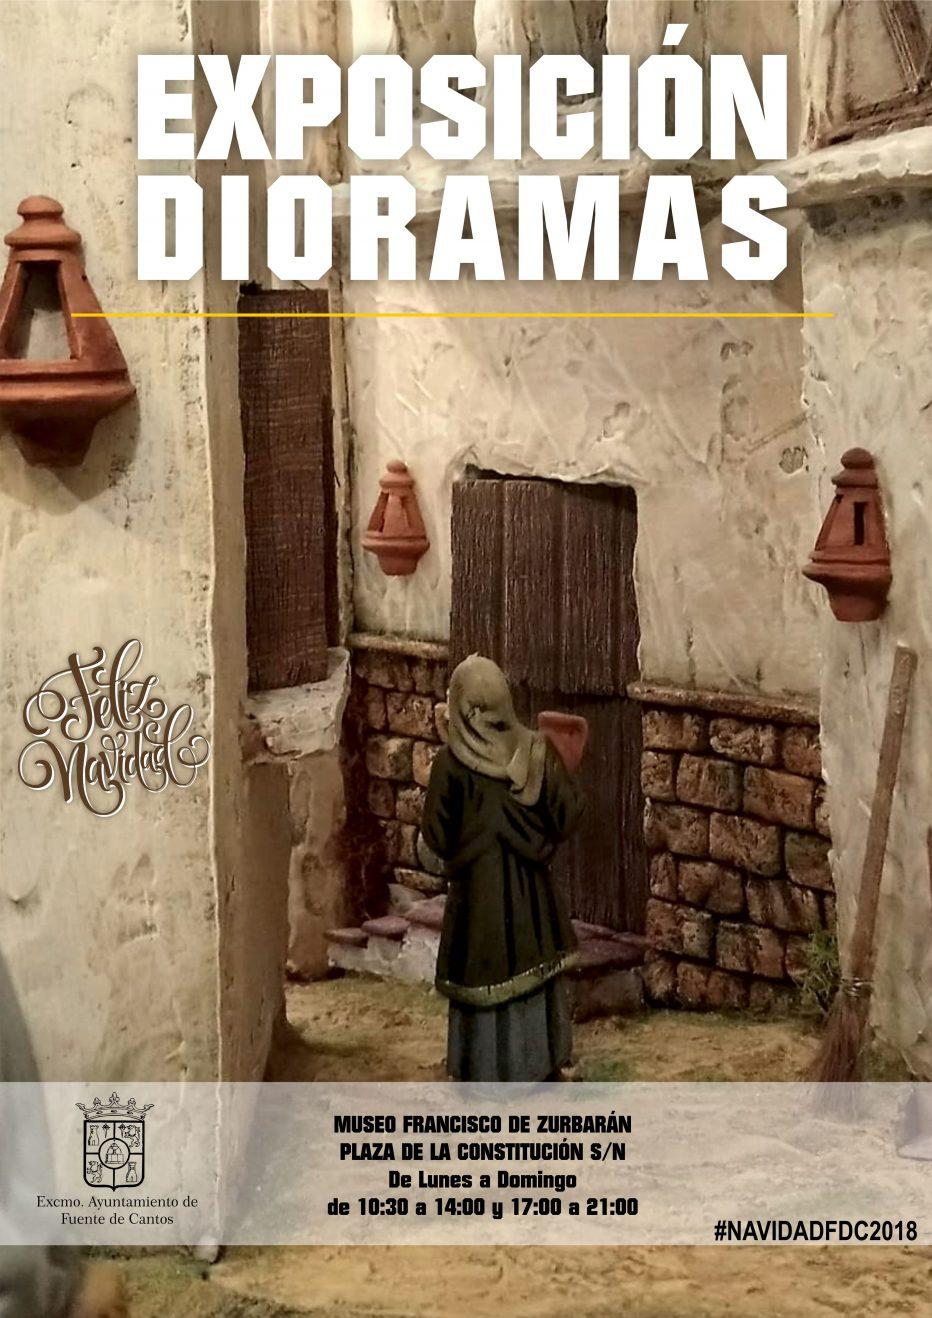 Exposición de DIORAMAS Navideños en Fuente de Cantos